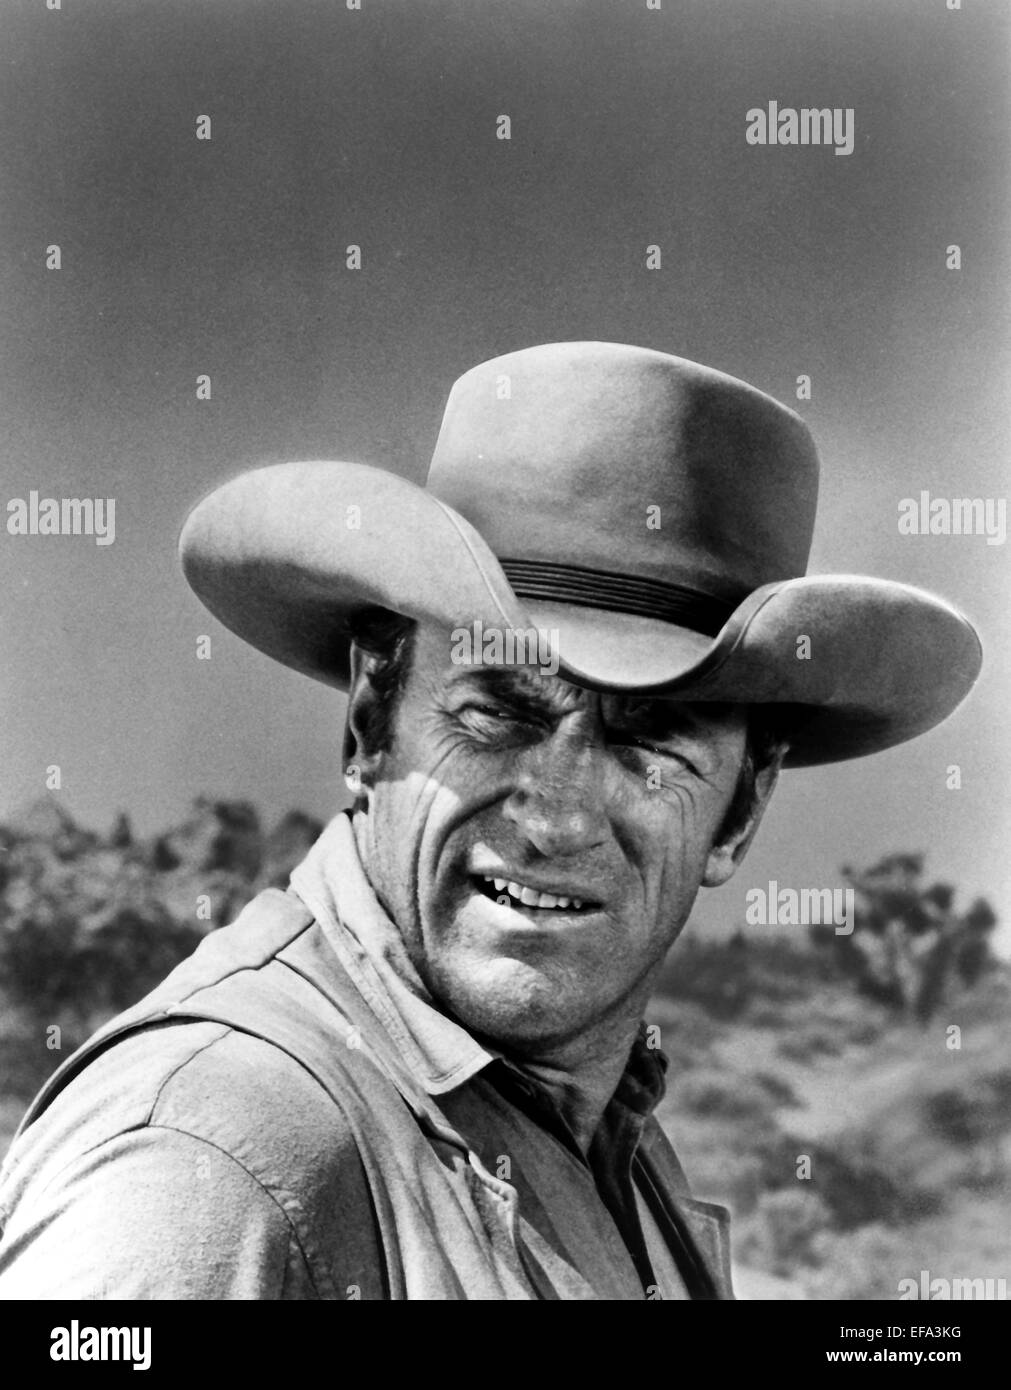 JAMES ARNESS GUNSMOKE (1955 Stock Photo: 78283732 - Alamy